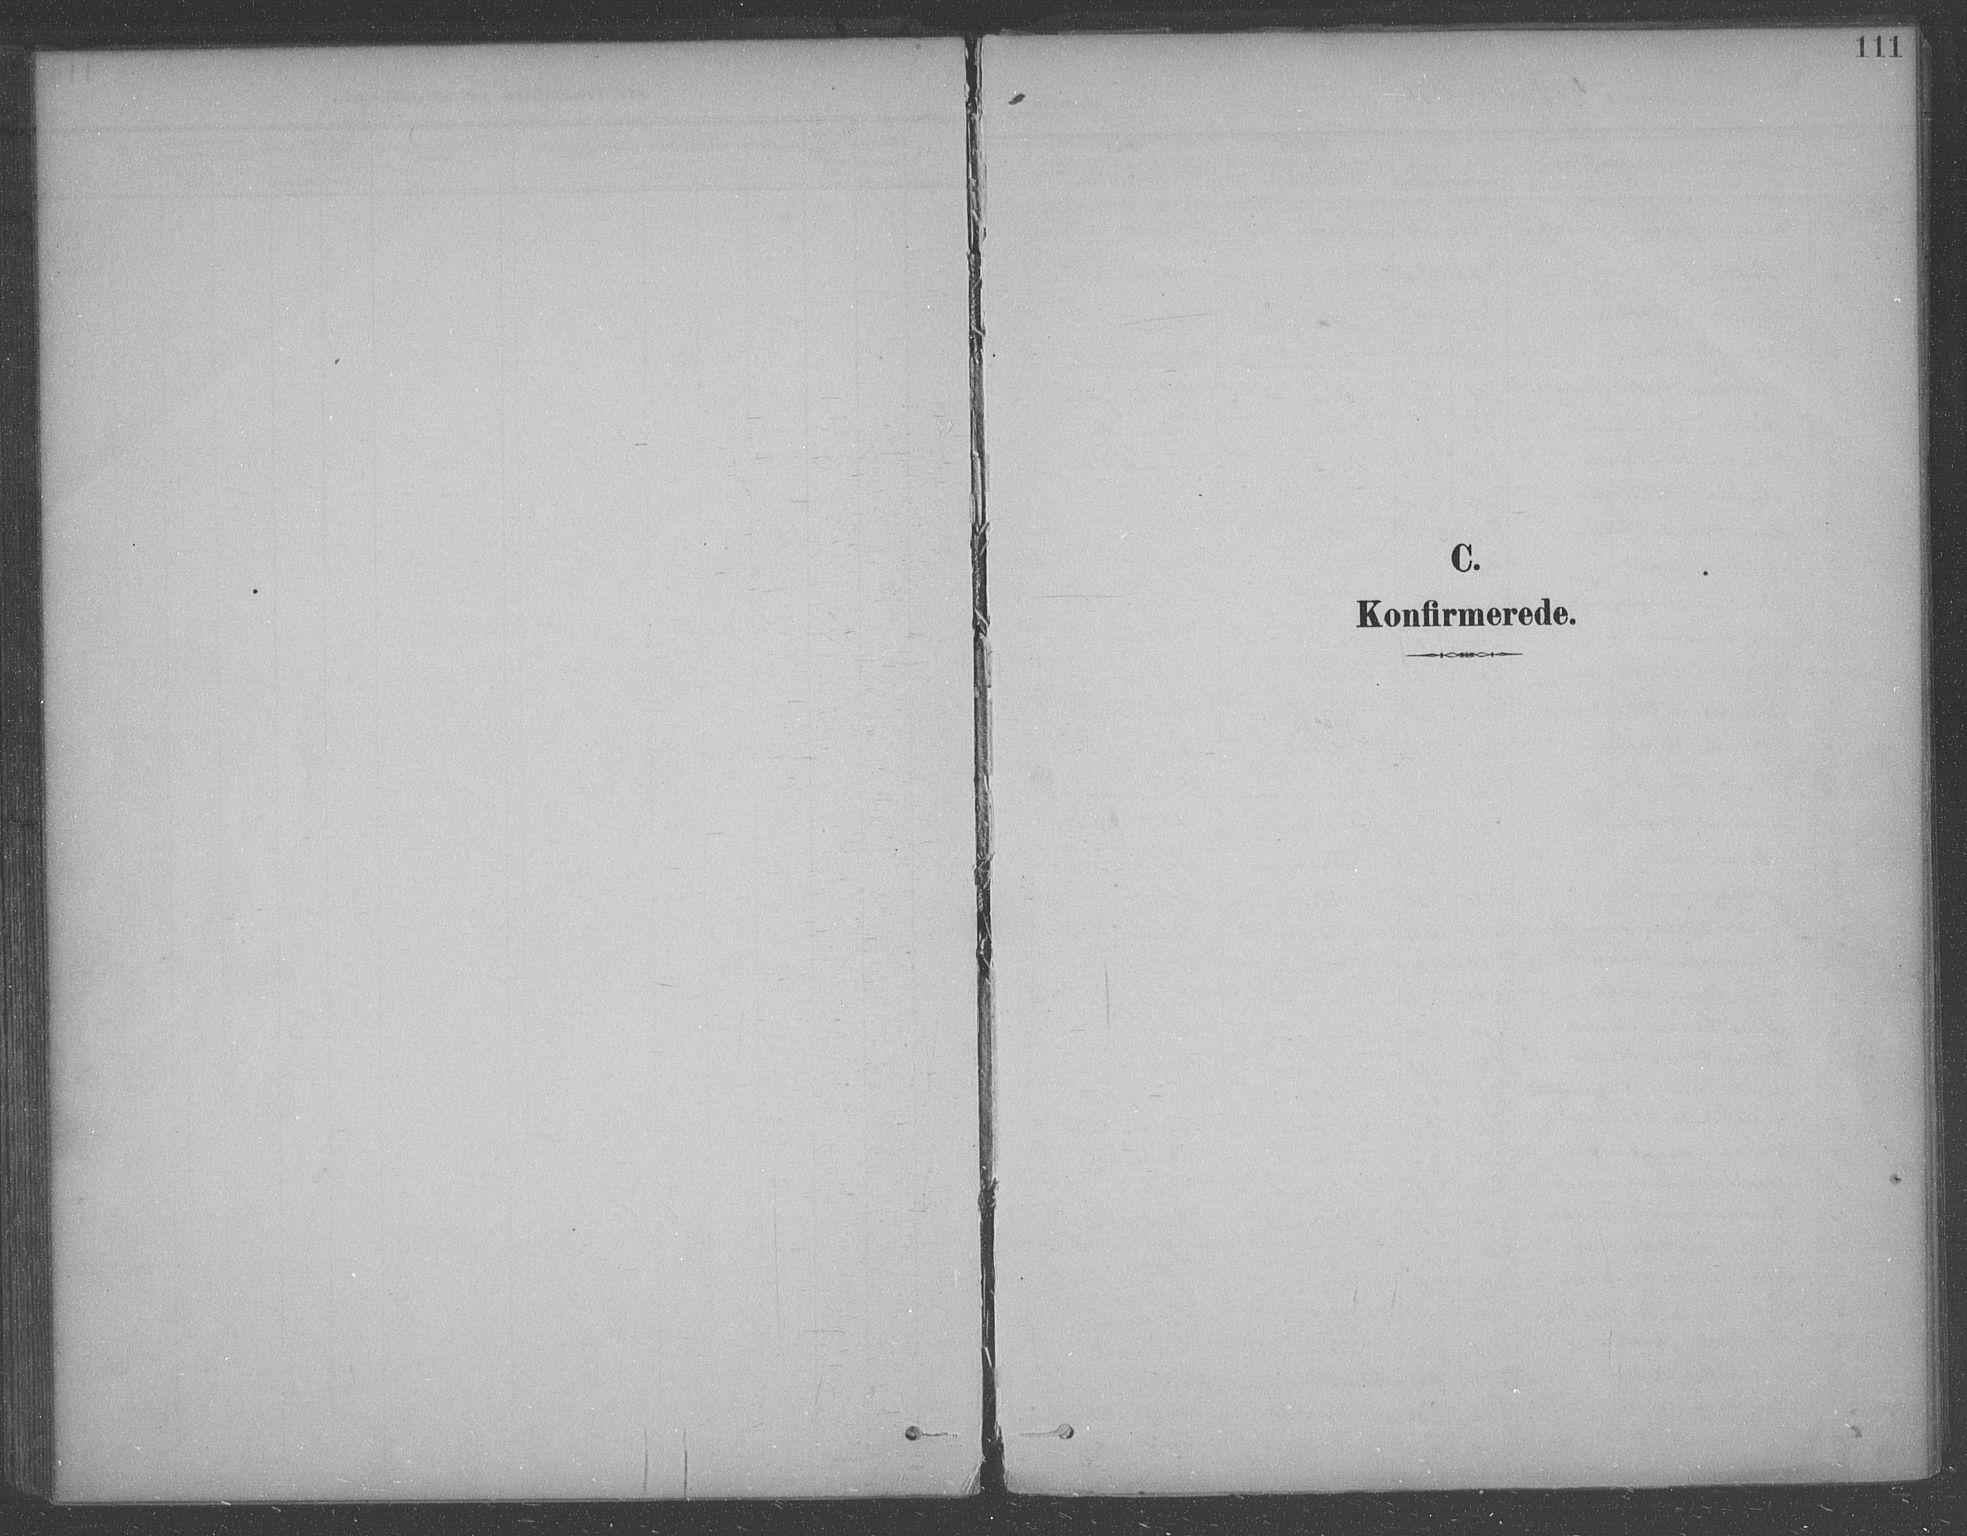 SAO, Aremark prestekontor Kirkebøker, F/Fb/L0005: Ministerialbok nr. II 5, 1895-1919, s. 111